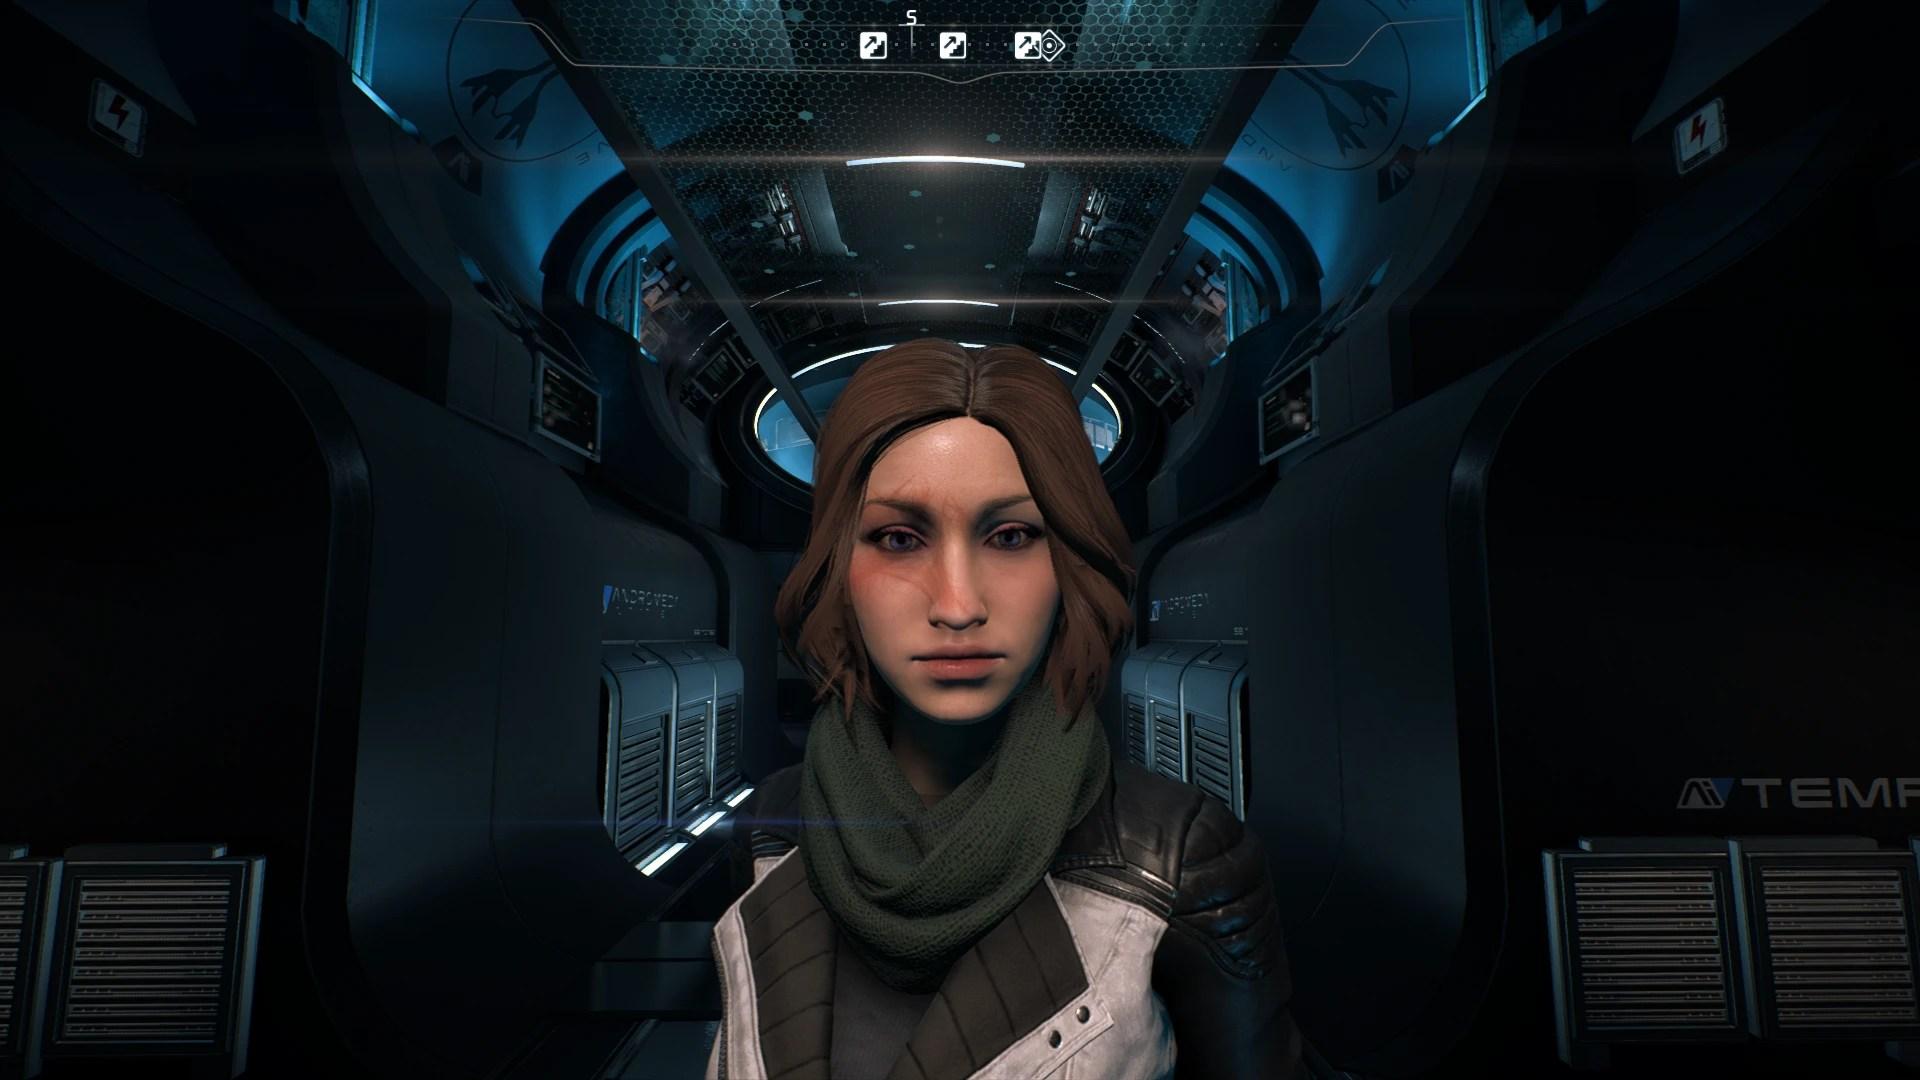 Custom Ryder Sliders - Dana at Mass Effect Andromeda Nexus - Mods and Community